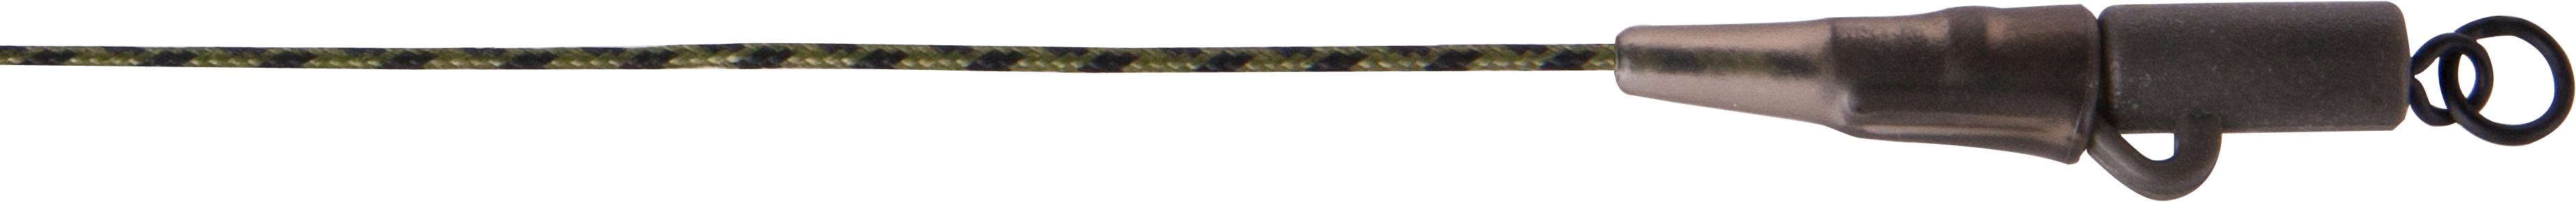 Anaconda návazec Safety Lead Clip Nosnost 35 lb, zelená, 2ks/bal